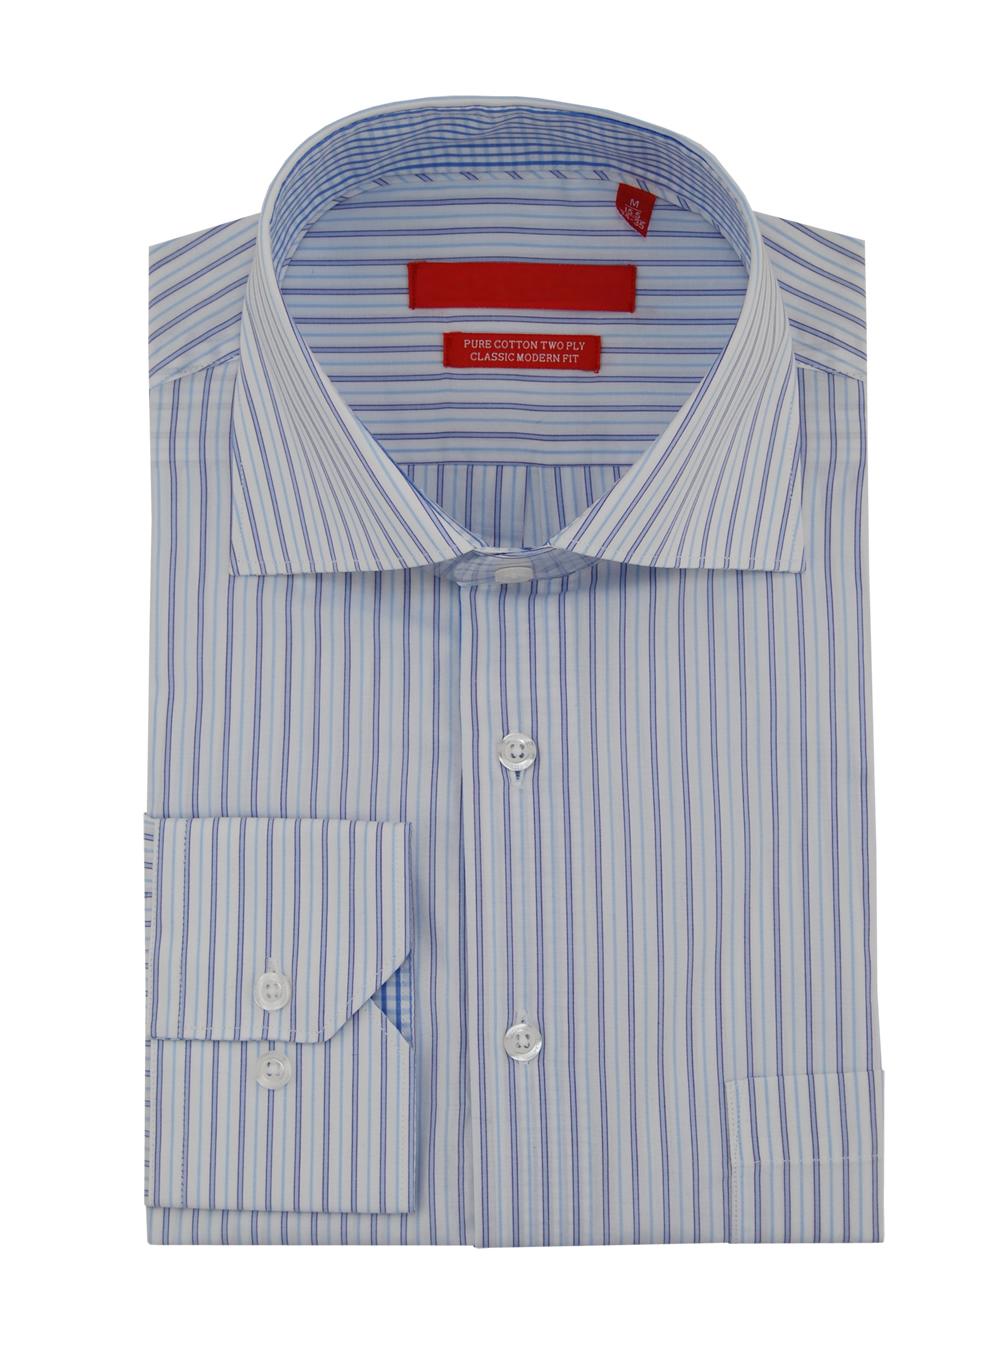 Dti Gv Executive Mens Striped Dress Shirt Cotton Spread Collar